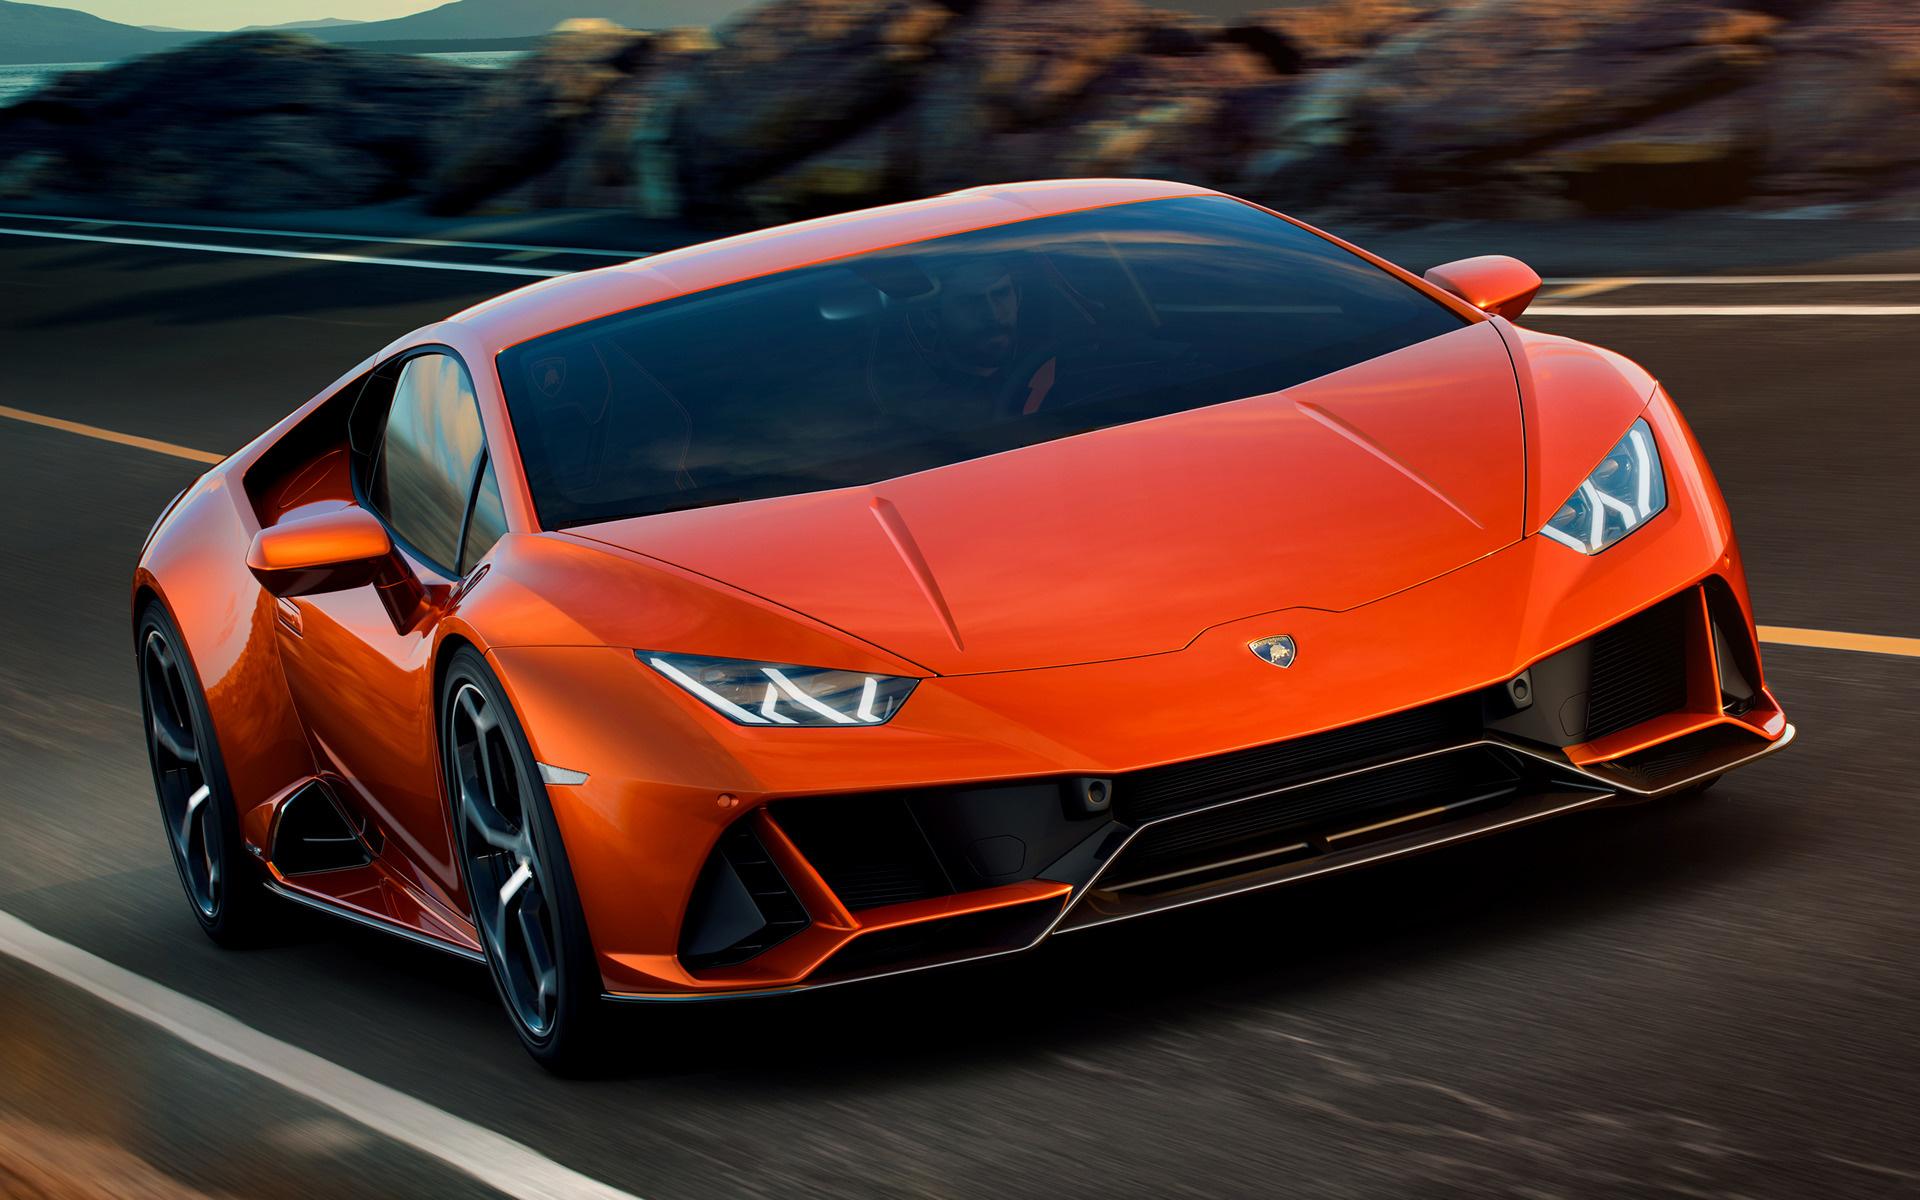 2019 Lamborghini Huracan Evo Fondos De Pantalla E Imágenes